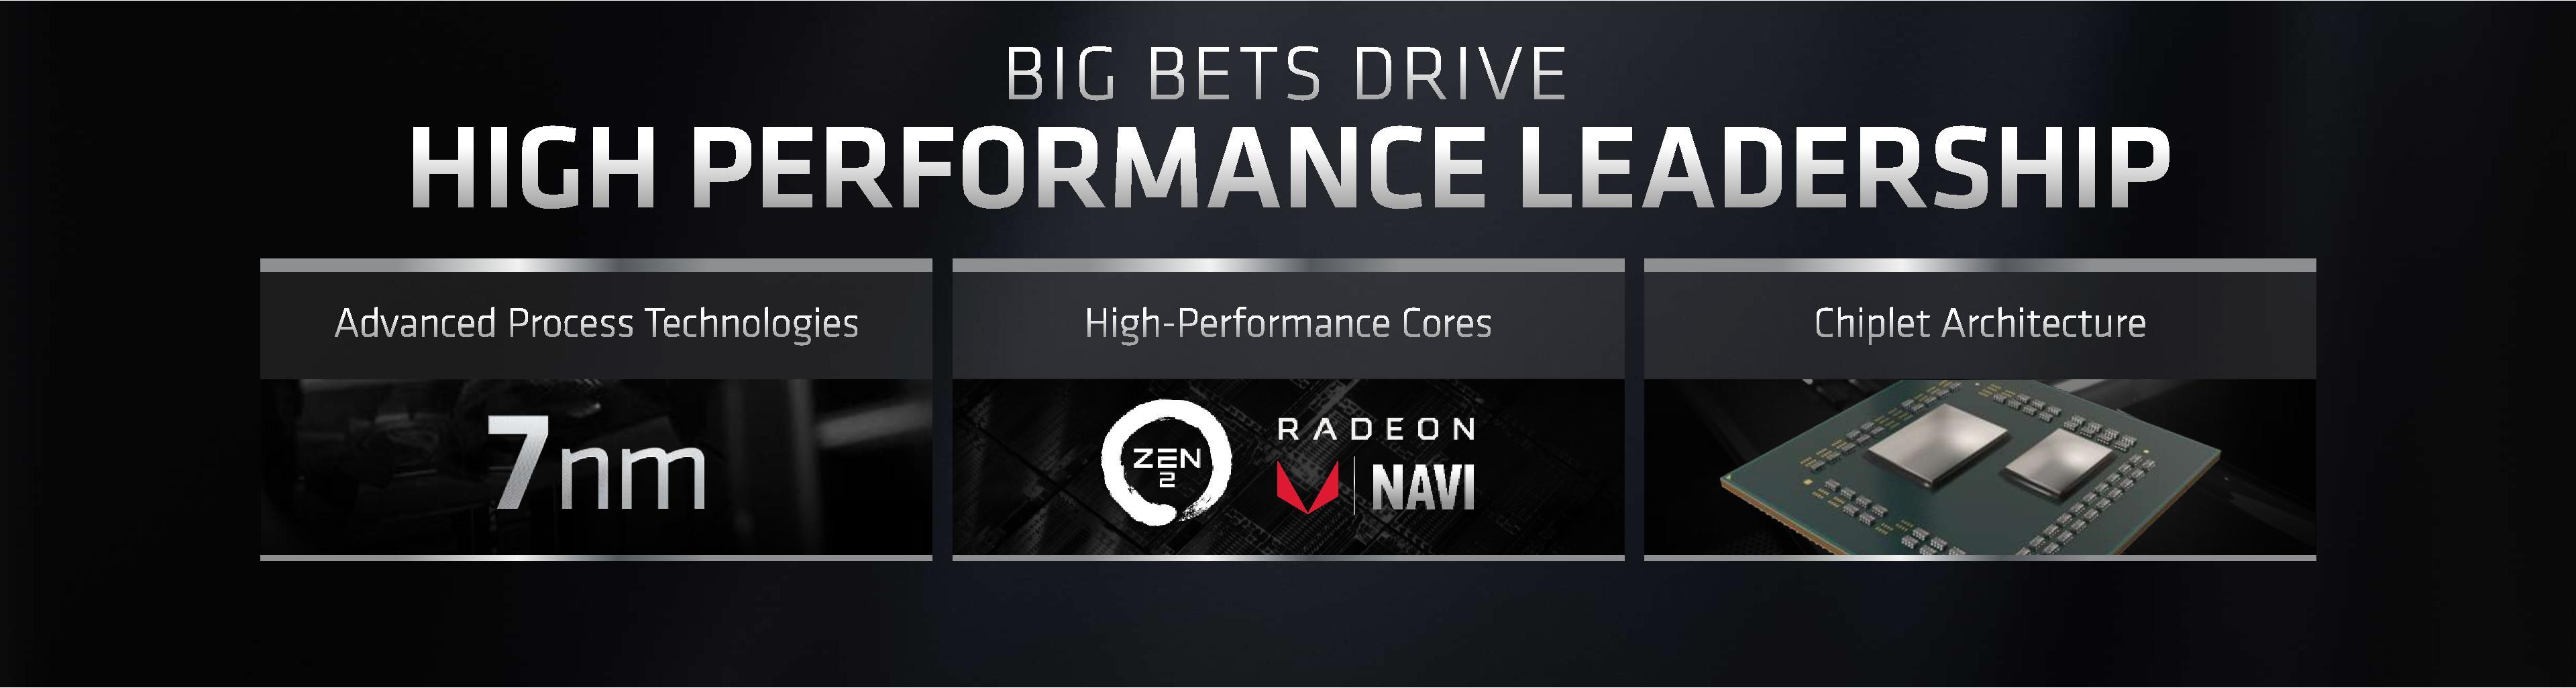 AMD Ryzen 3000 Computex Slide Deck - AMD Ryzen 3000 Announced: Five